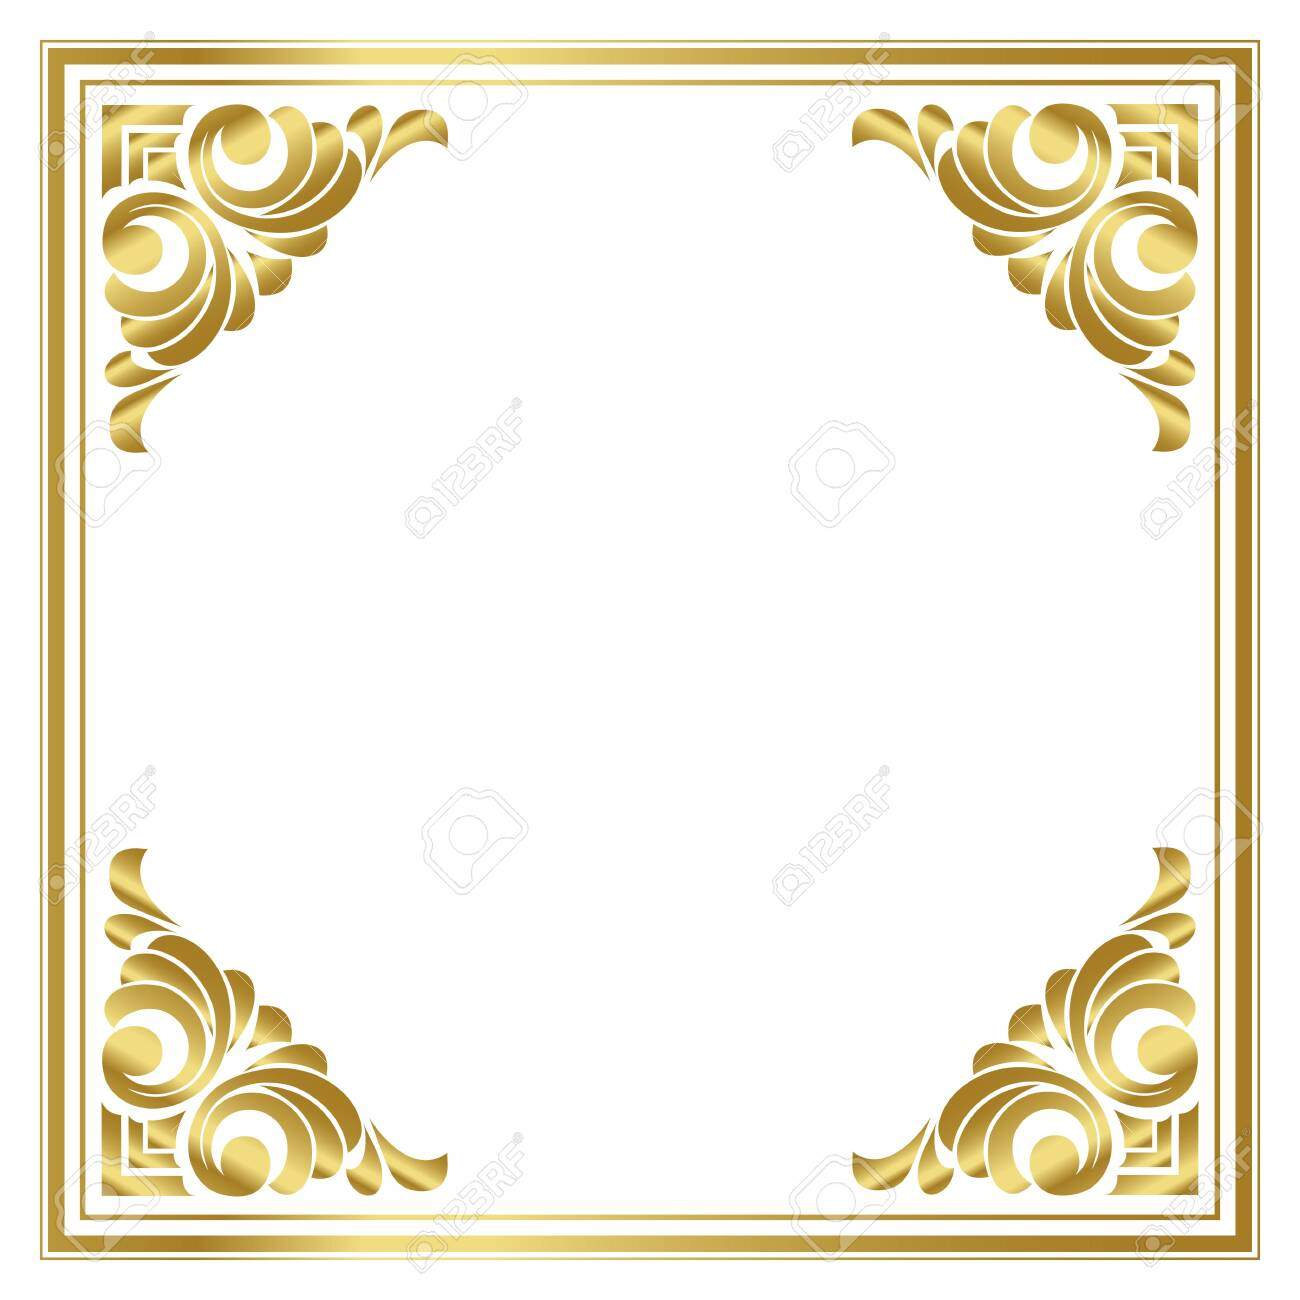 vector trendy design template for wedding or birthday invitation